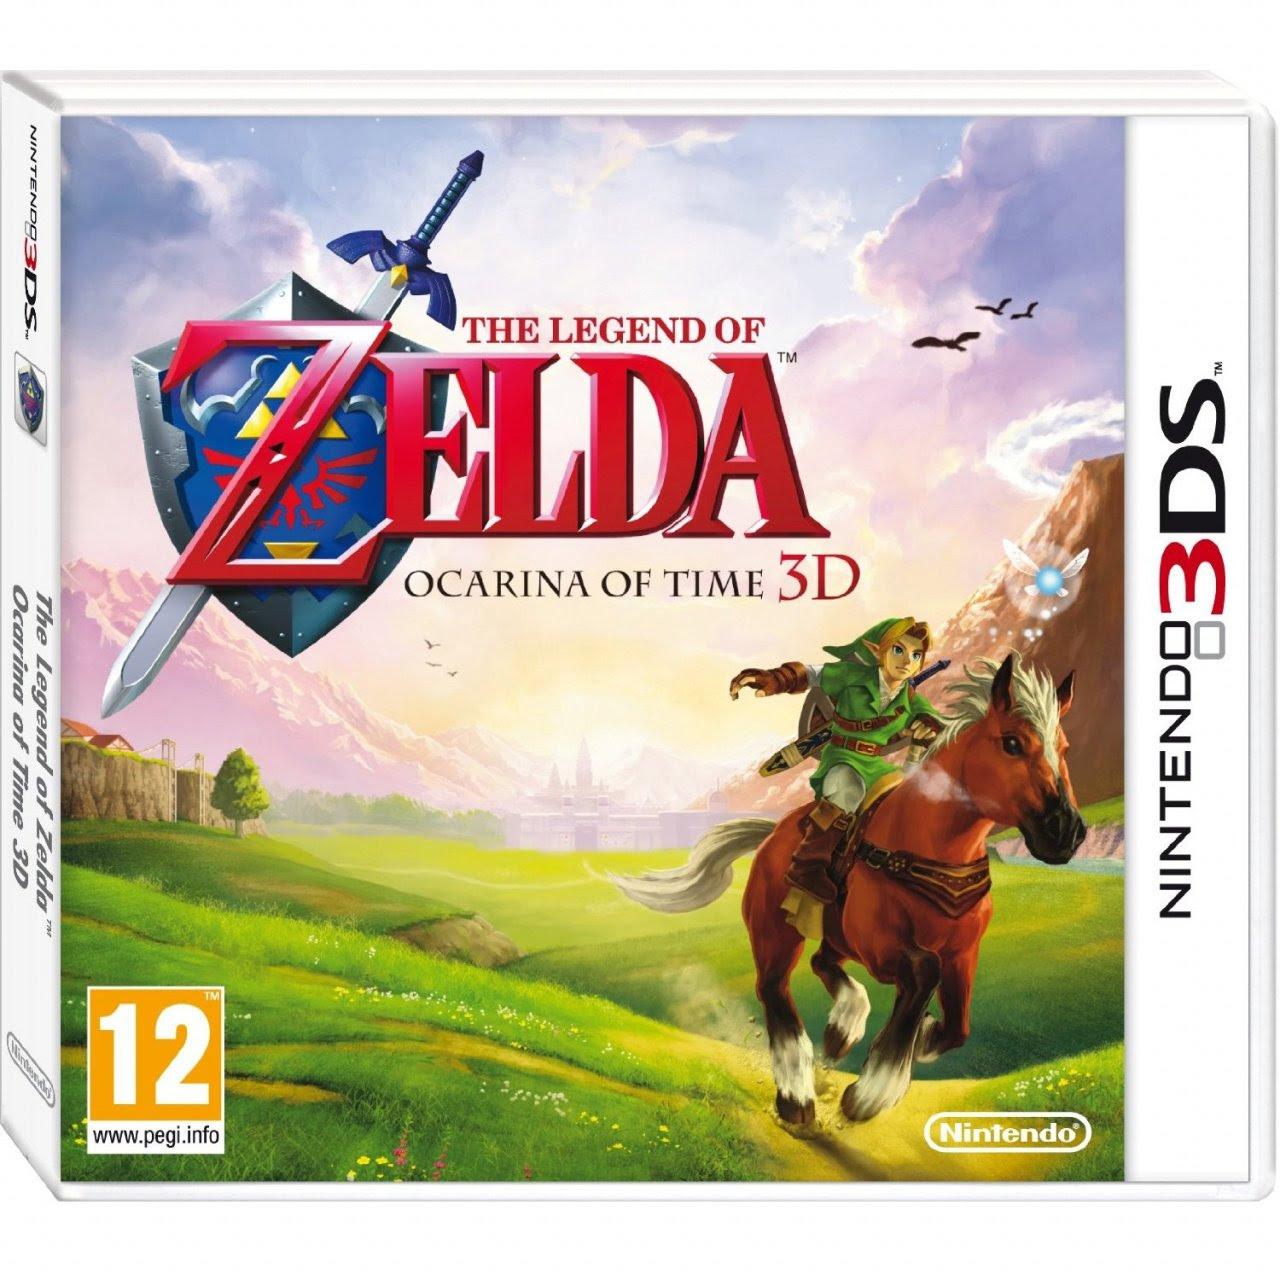 Zelda Ocarina Of Time 3d S European Box Art Is Simply Beautiful